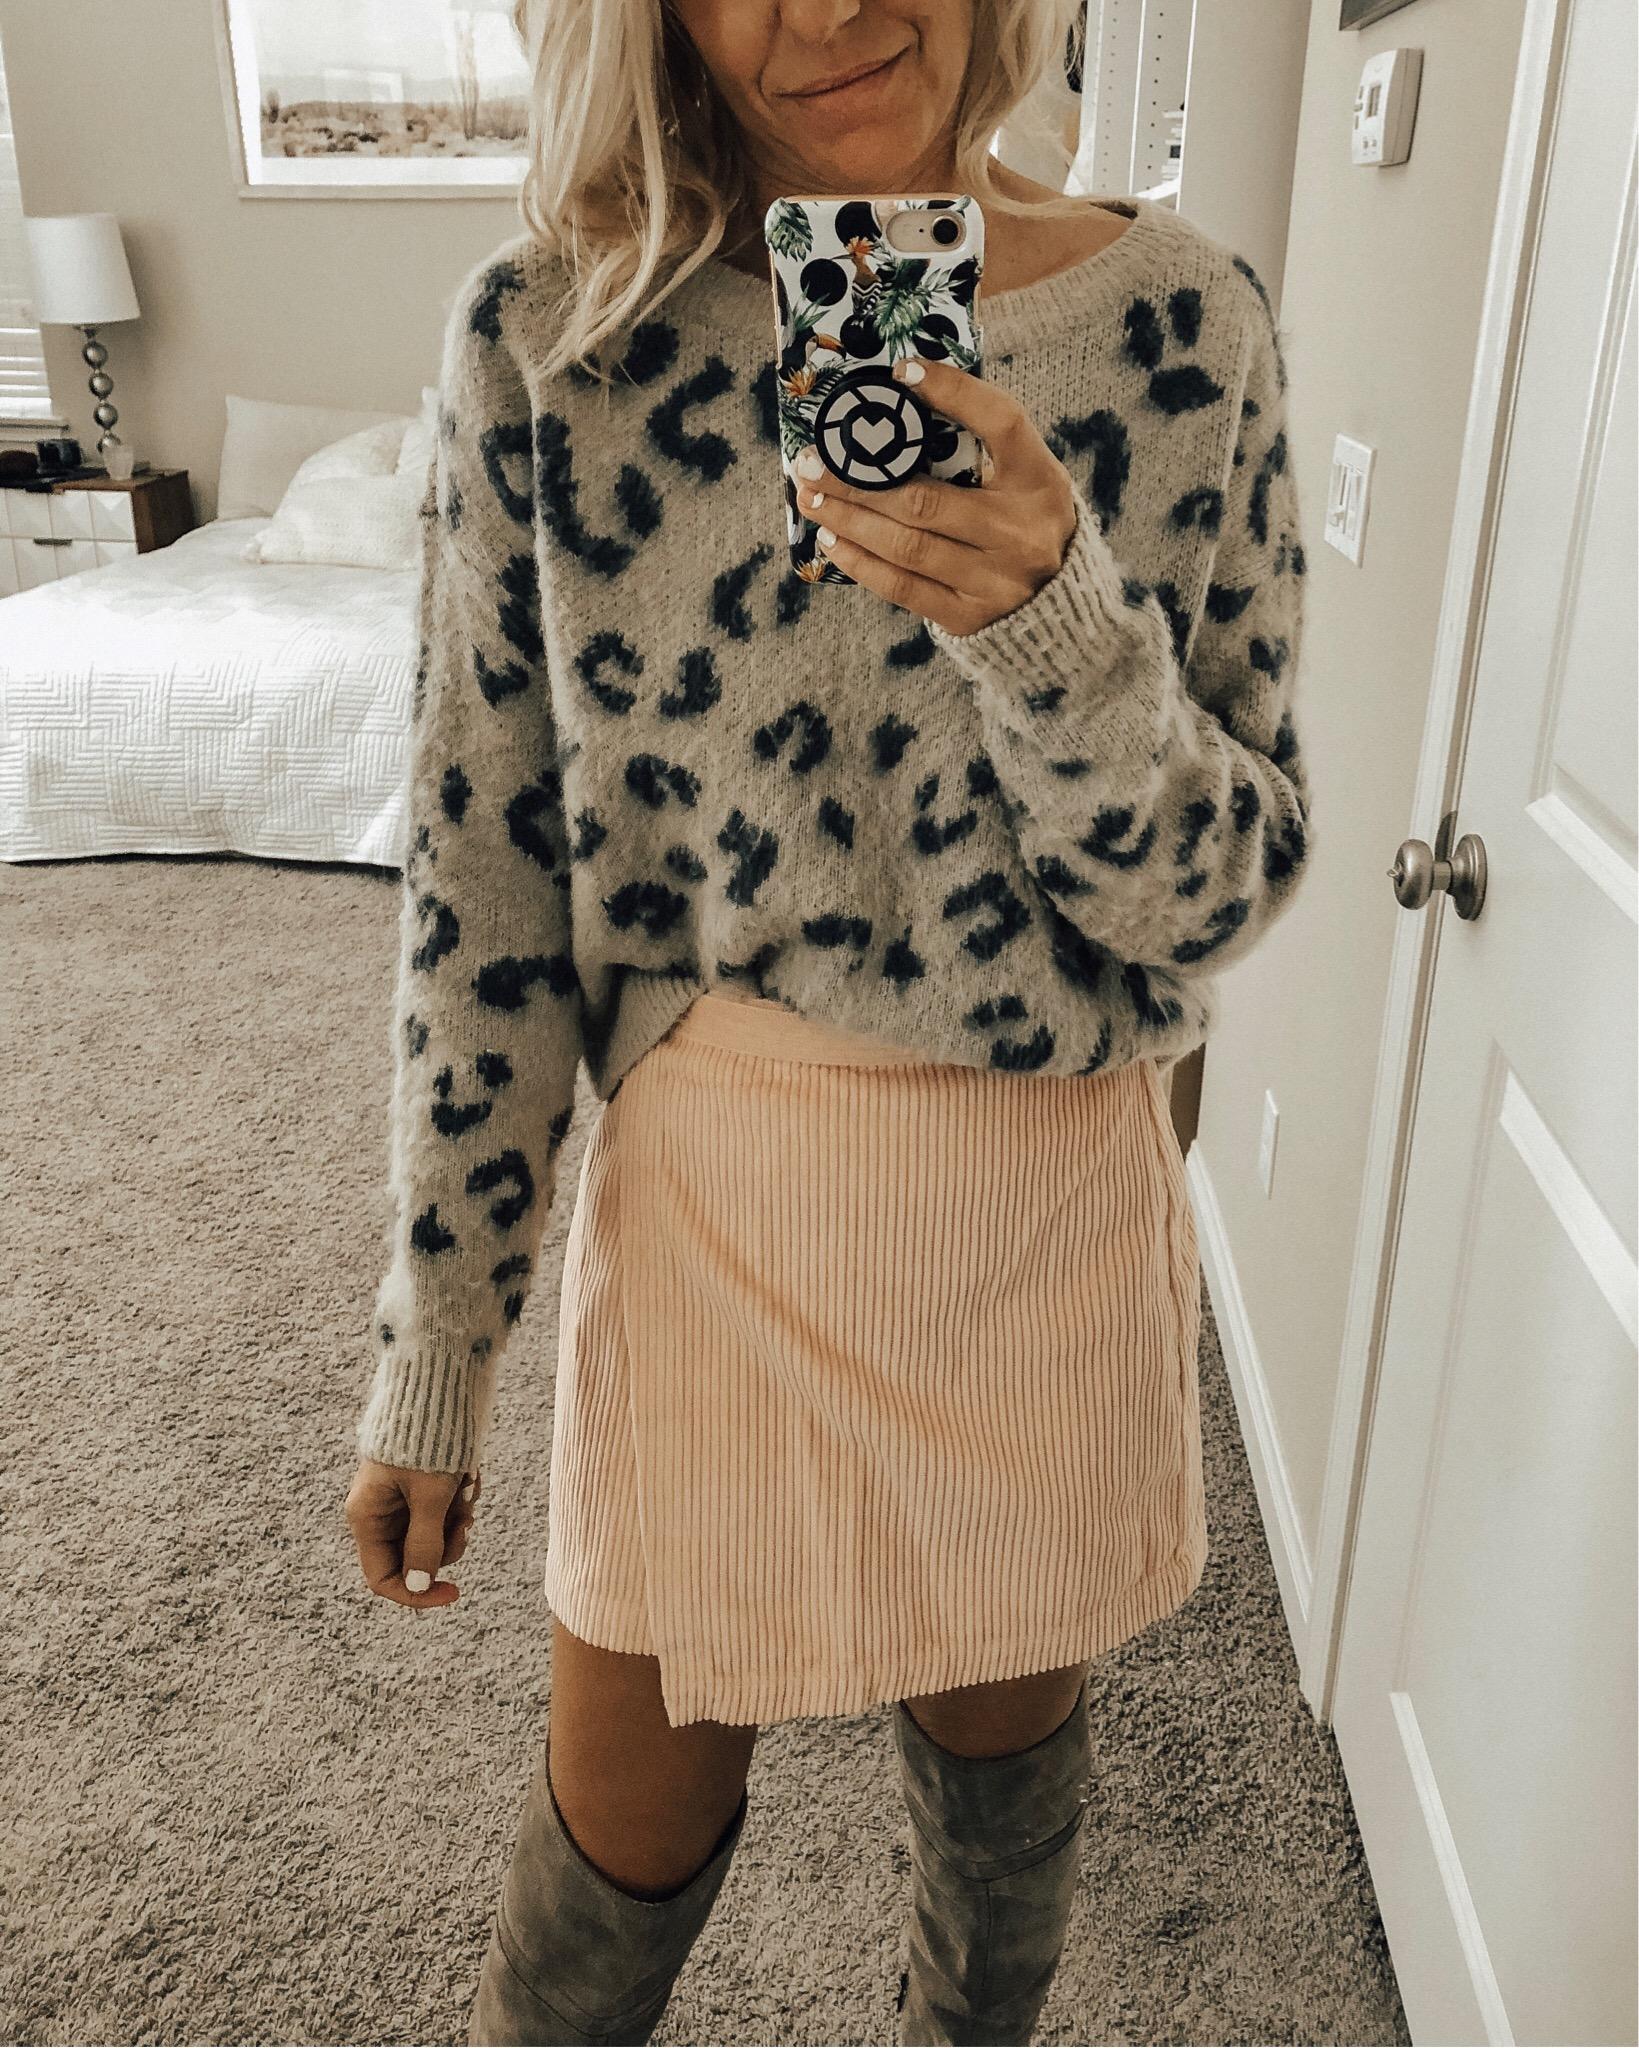 DECEMBER TOP 10- Jaclyn De Leon Style + leopard cozy sweater + pink skirt + animal print + sweater weather + selfie + winter style + otk boots + abercrombie